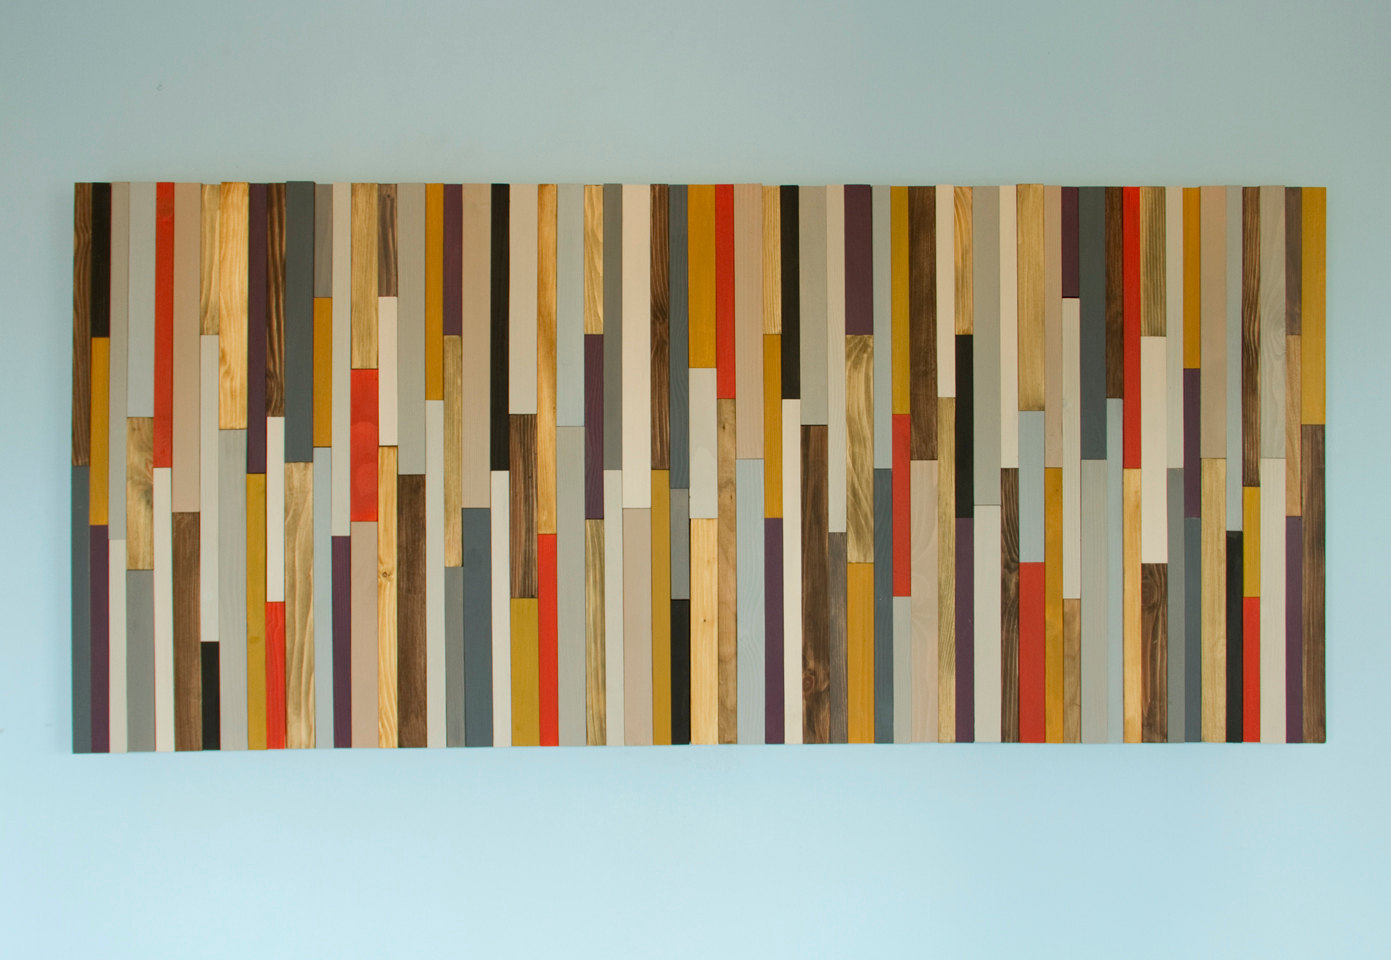 Modern Headboard Wood Wall Art Sculpture, king headboard